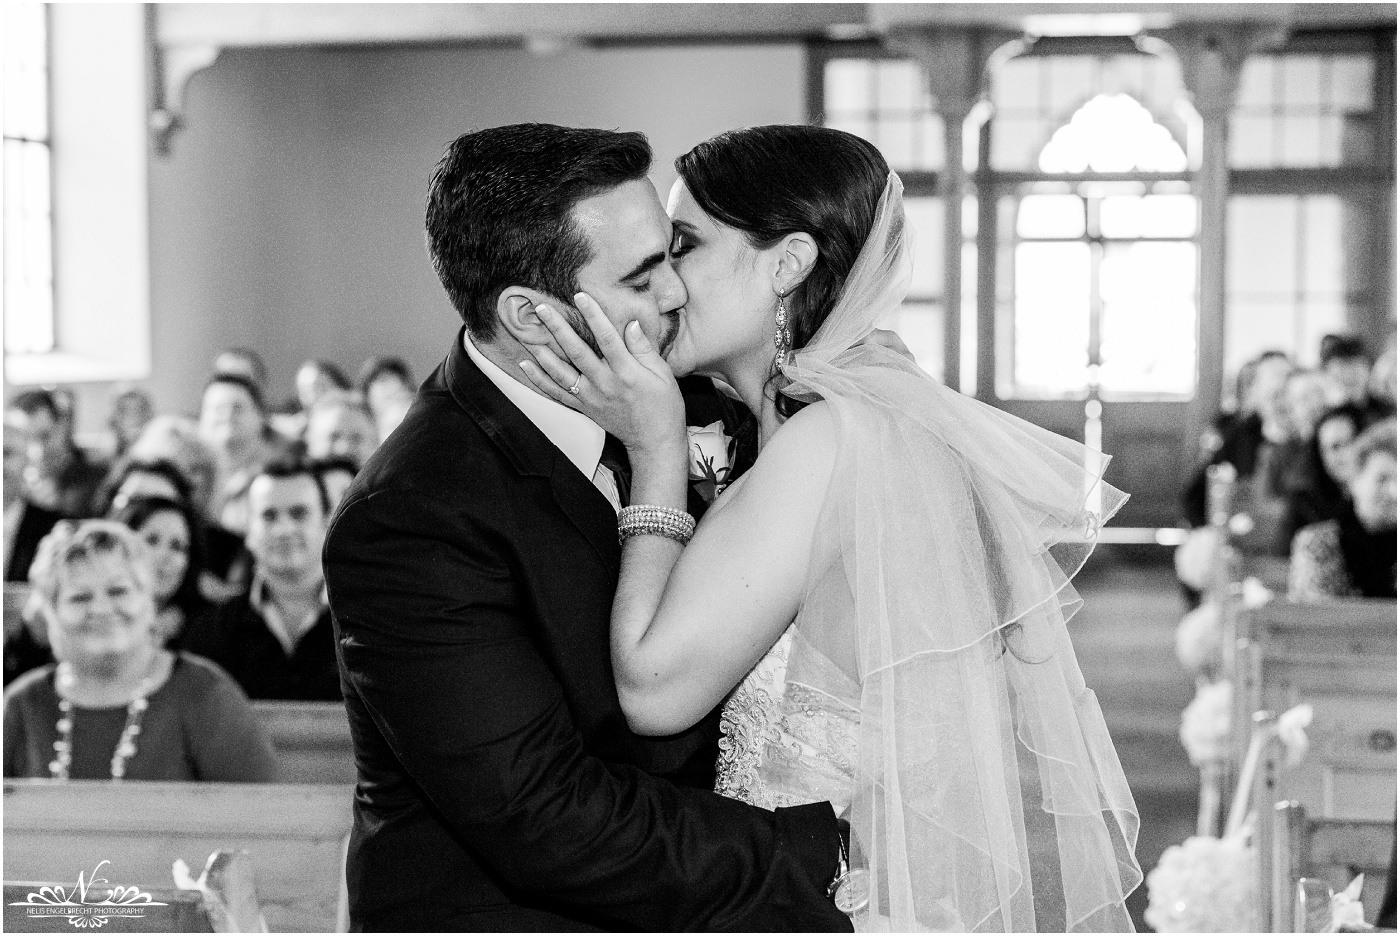 Eensgezind-Wedding-Photos-Nelis-Engelbrecht-Photography-069